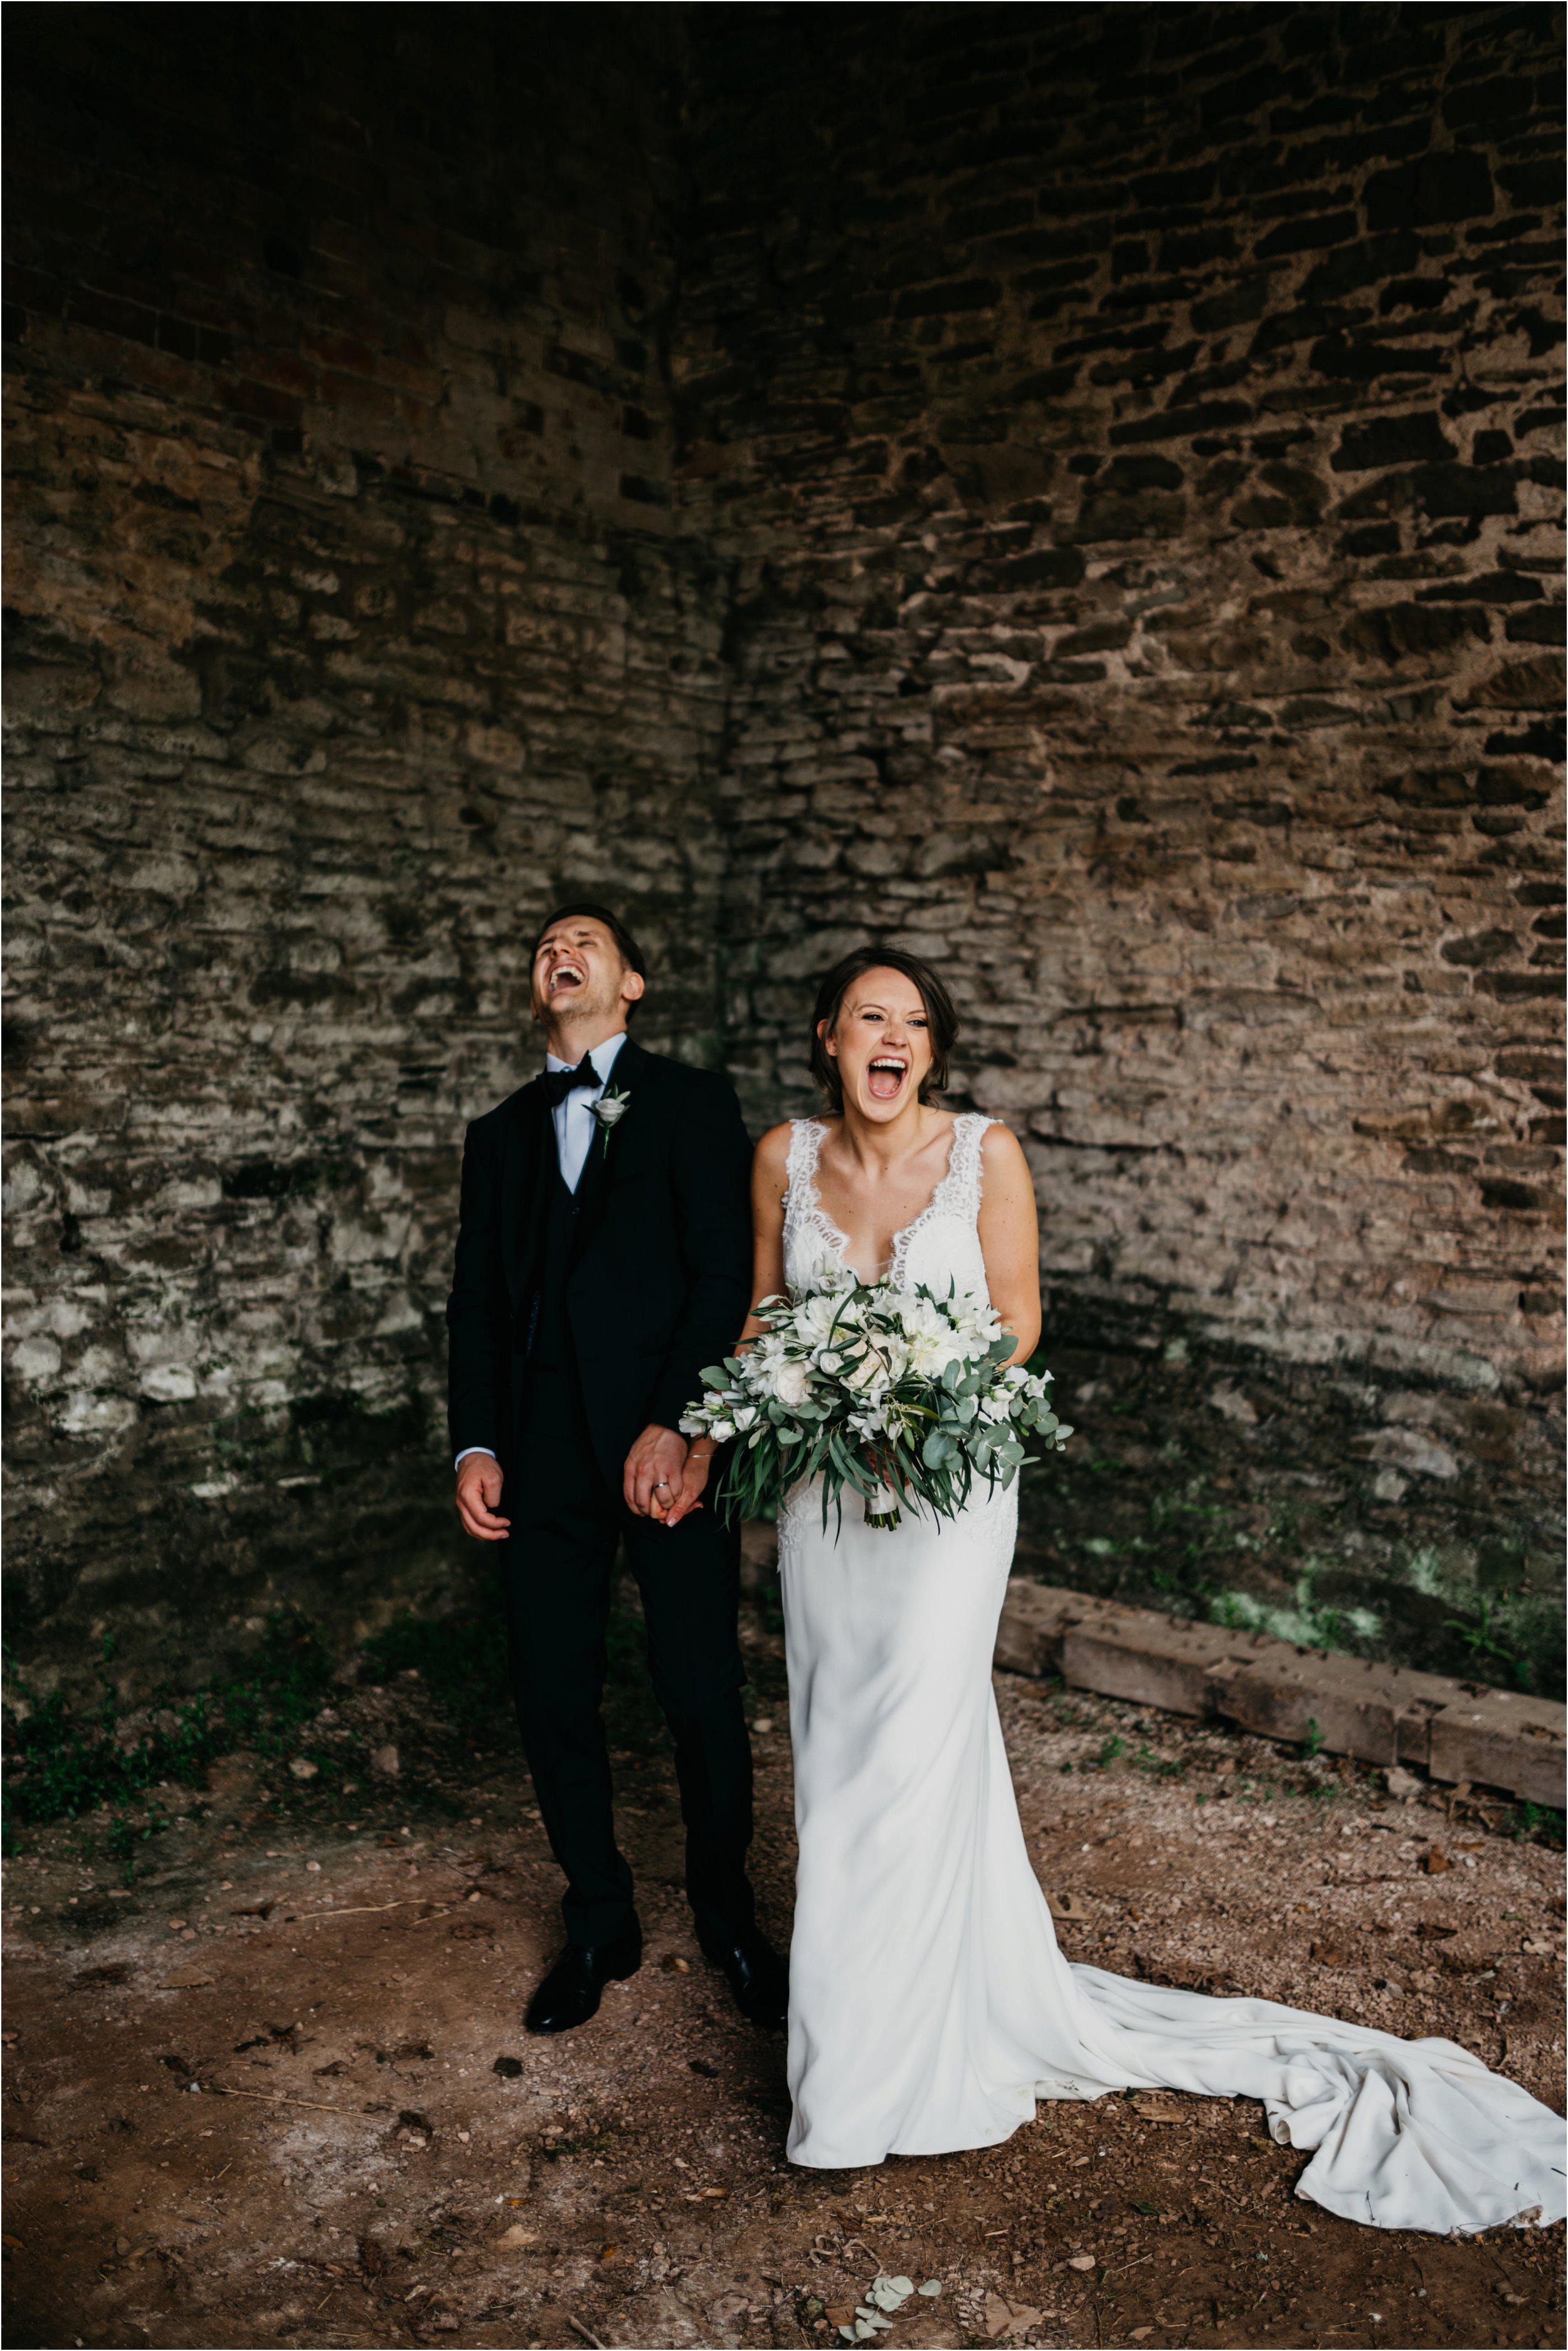 Dewsall Court Herefordshire wedding photographer_0081.jpg